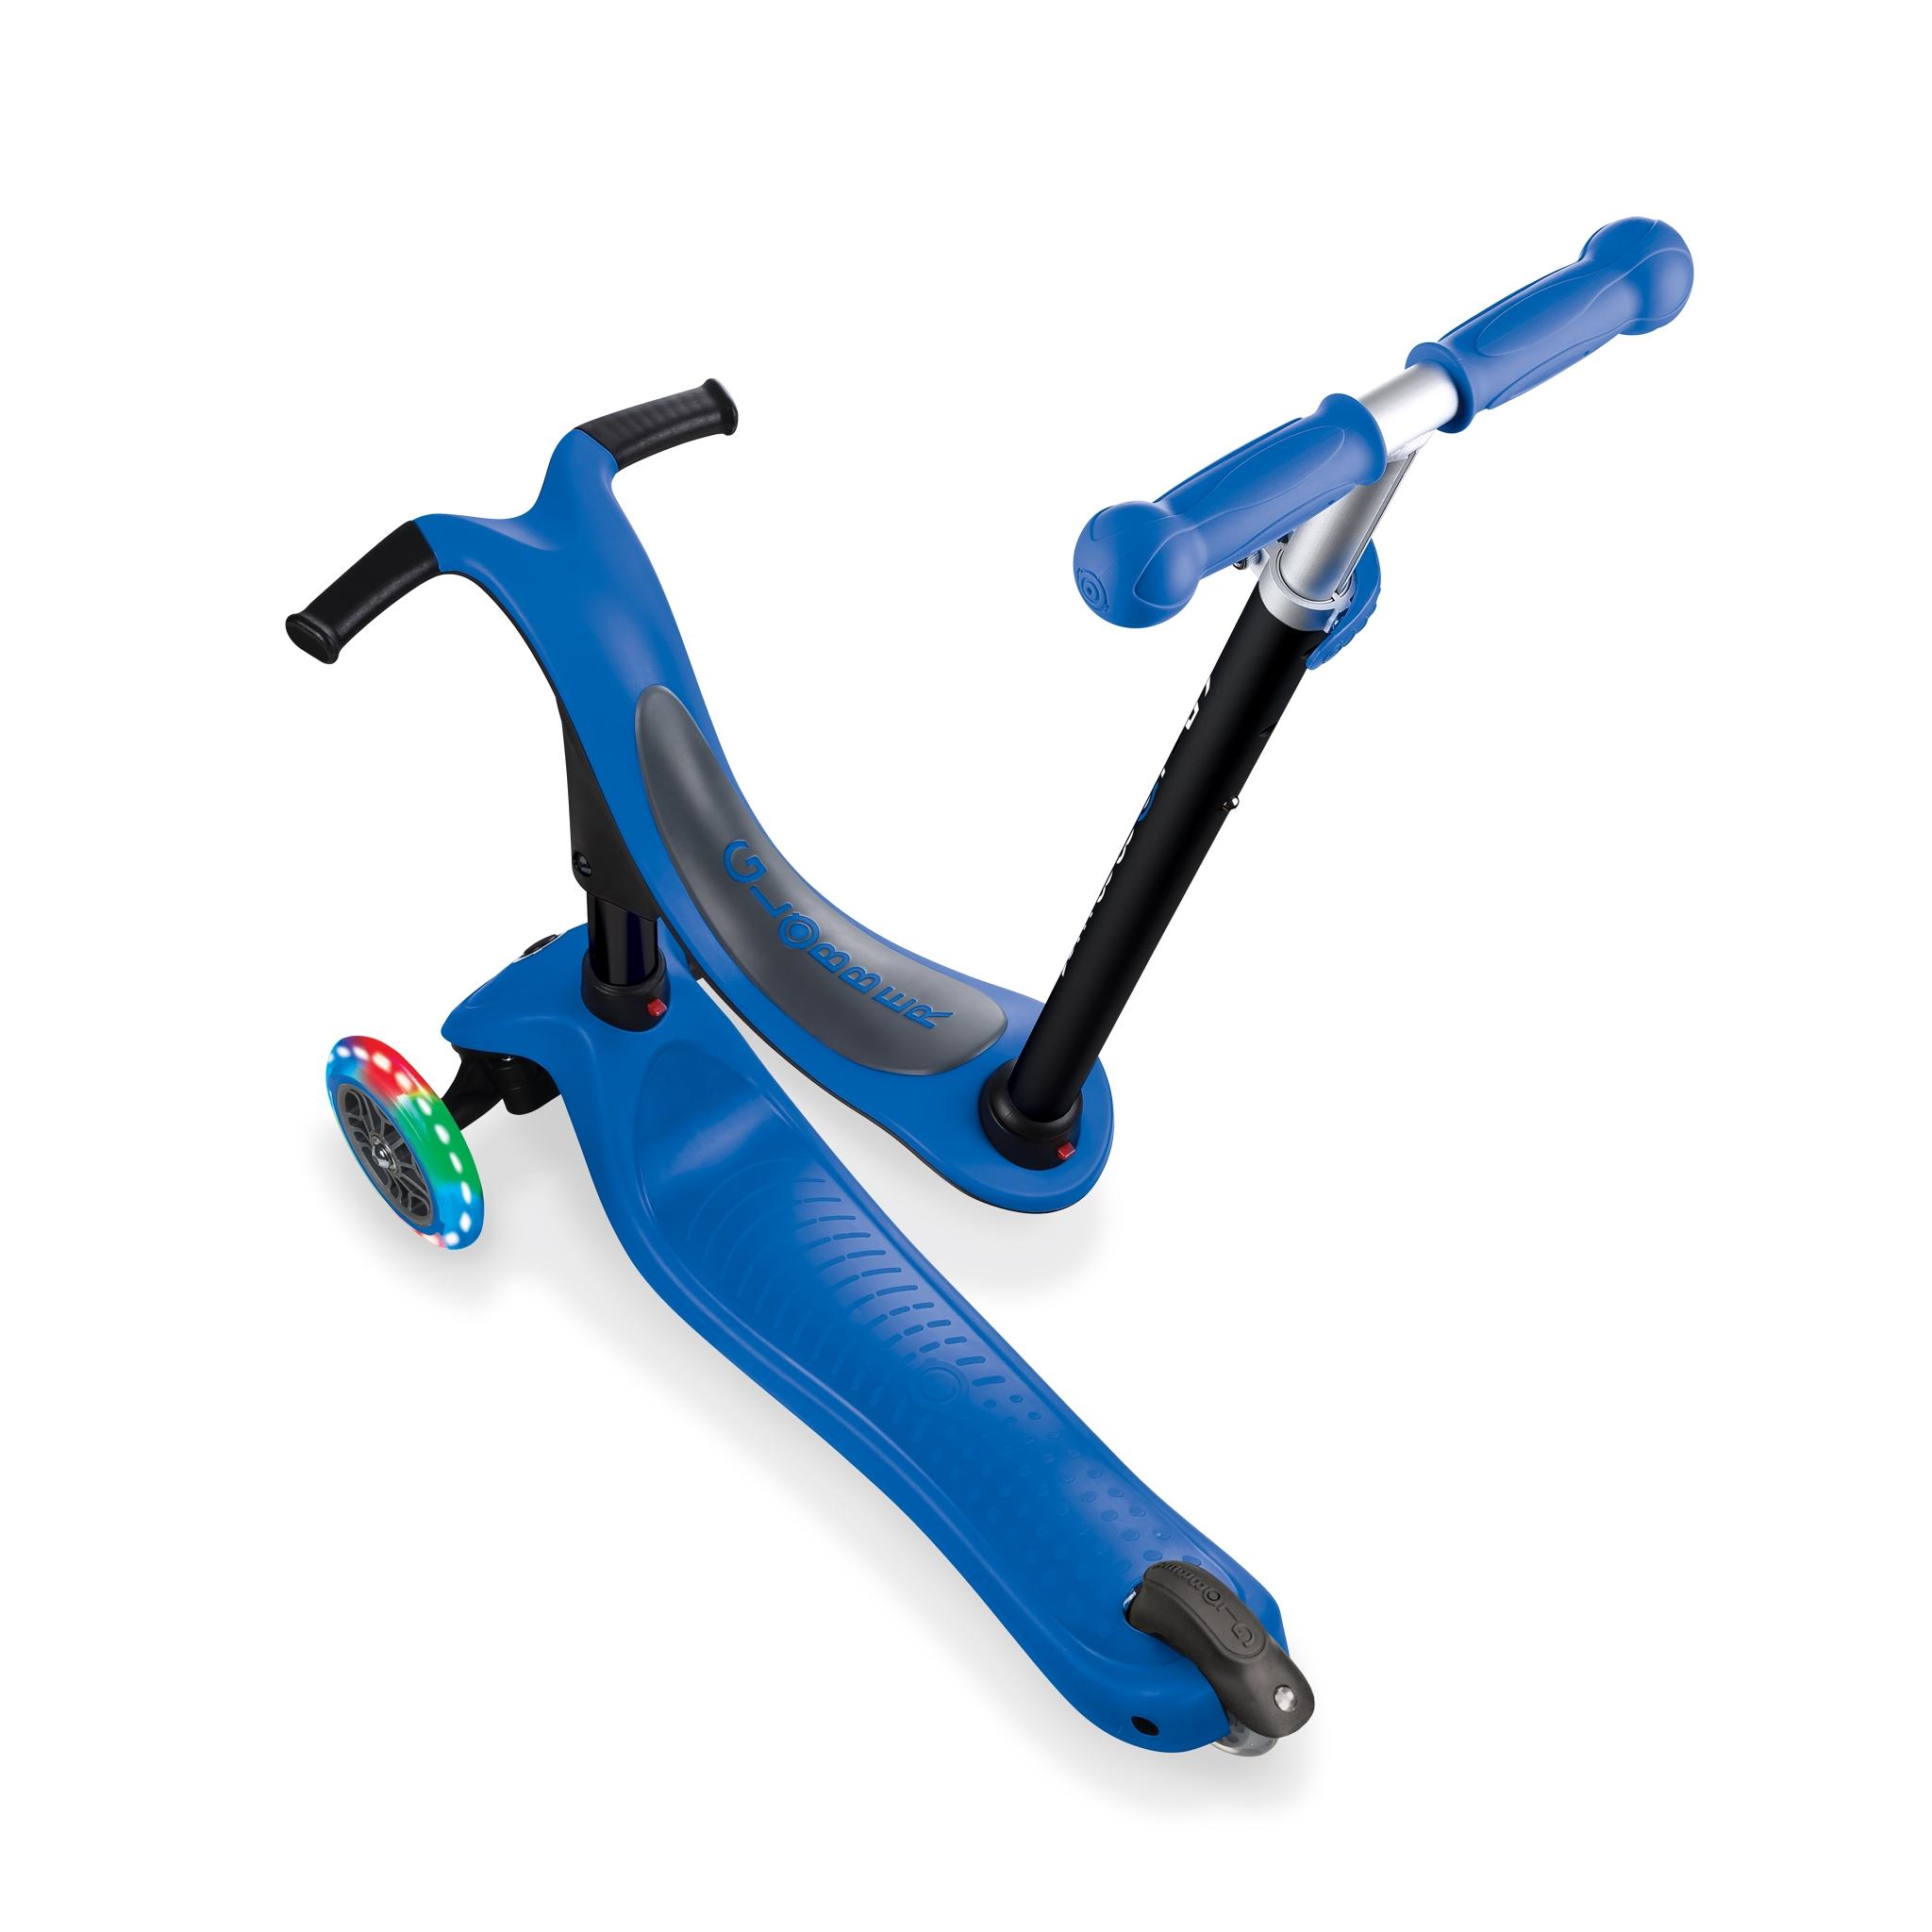 GO-UP-SPORTY-LIGHTS-ride-on-walking-bike-scooter-screwless-design-navy-blue